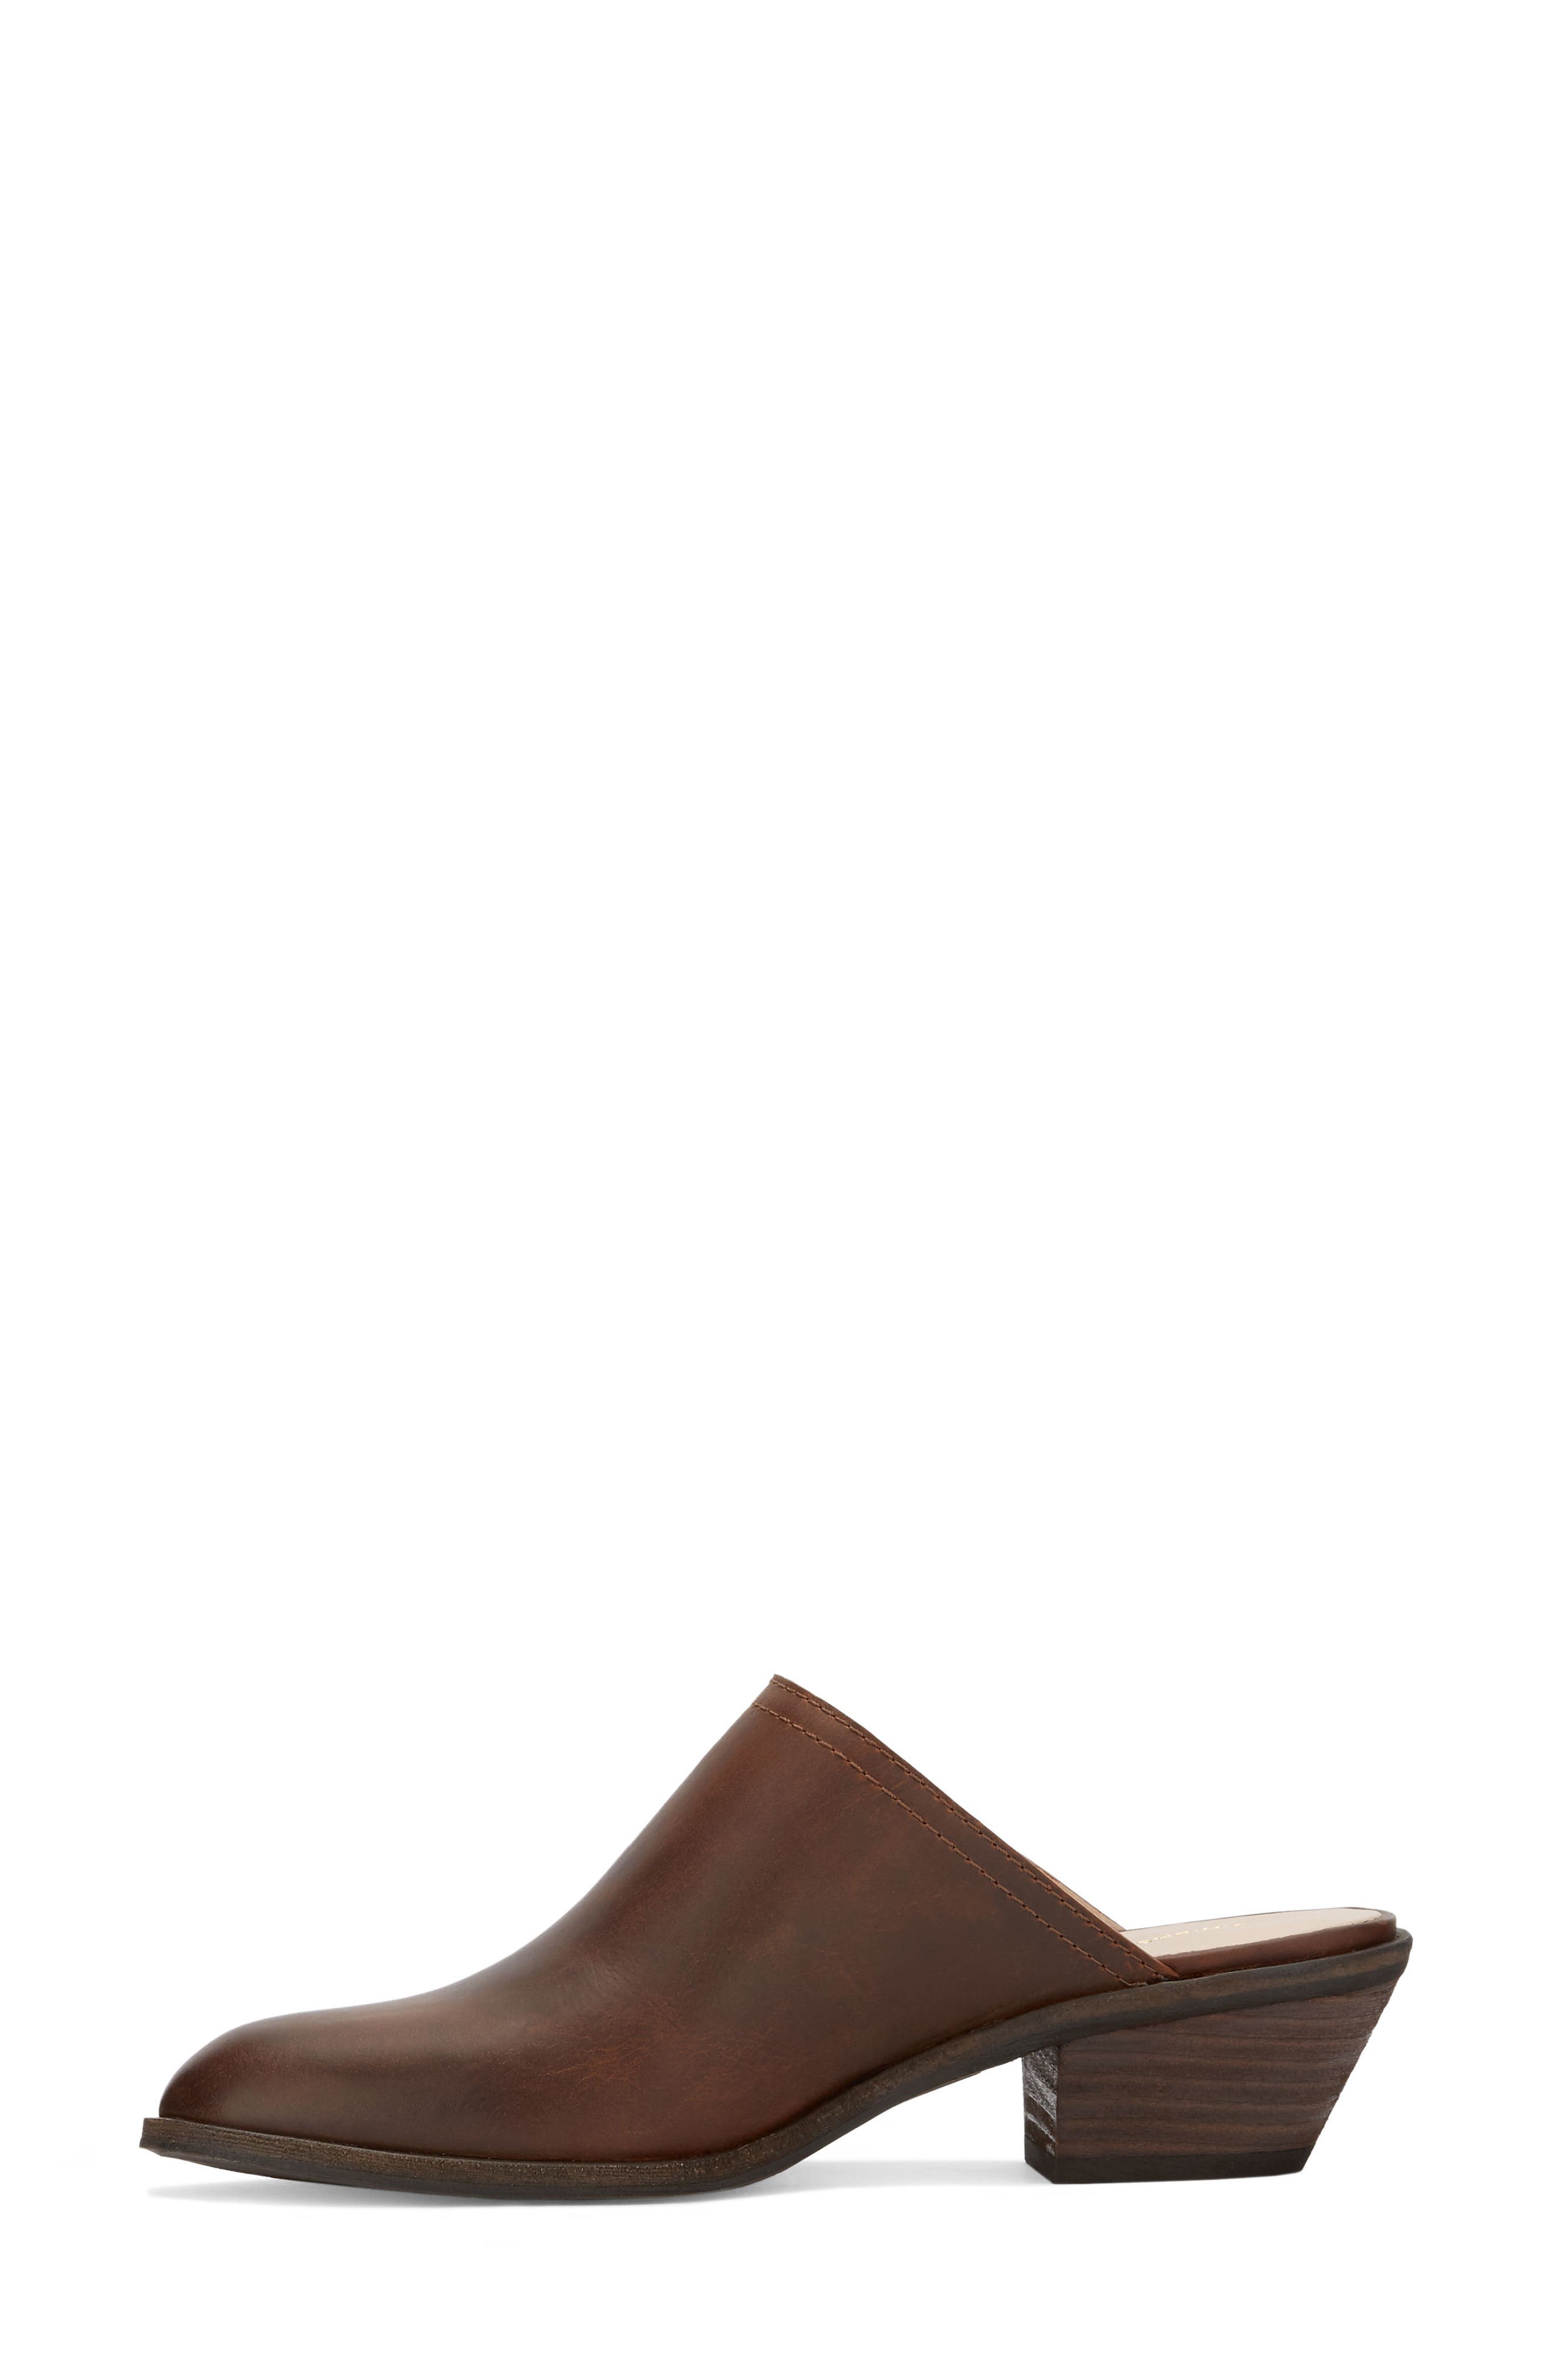 Nikki Mule,                             Alternate thumbnail 2, color,                             Dark Tan Leather